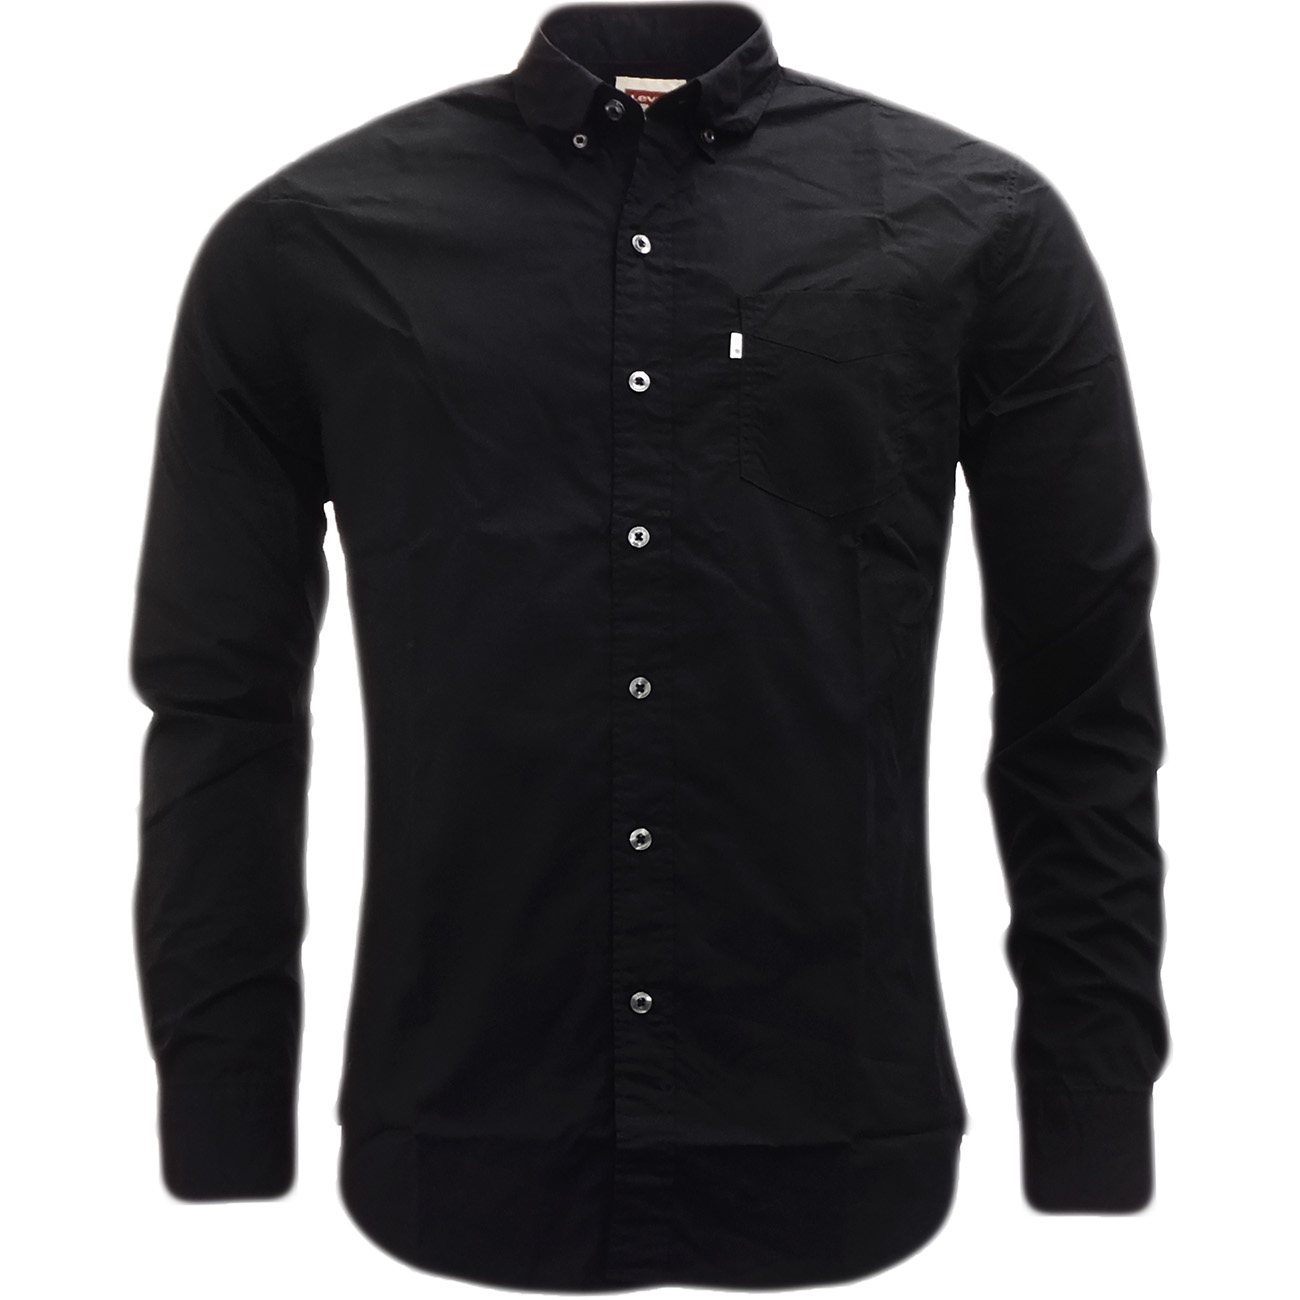 Mens Levi Strauss Plain Long Sleeve Shirt New Levi's Shirts